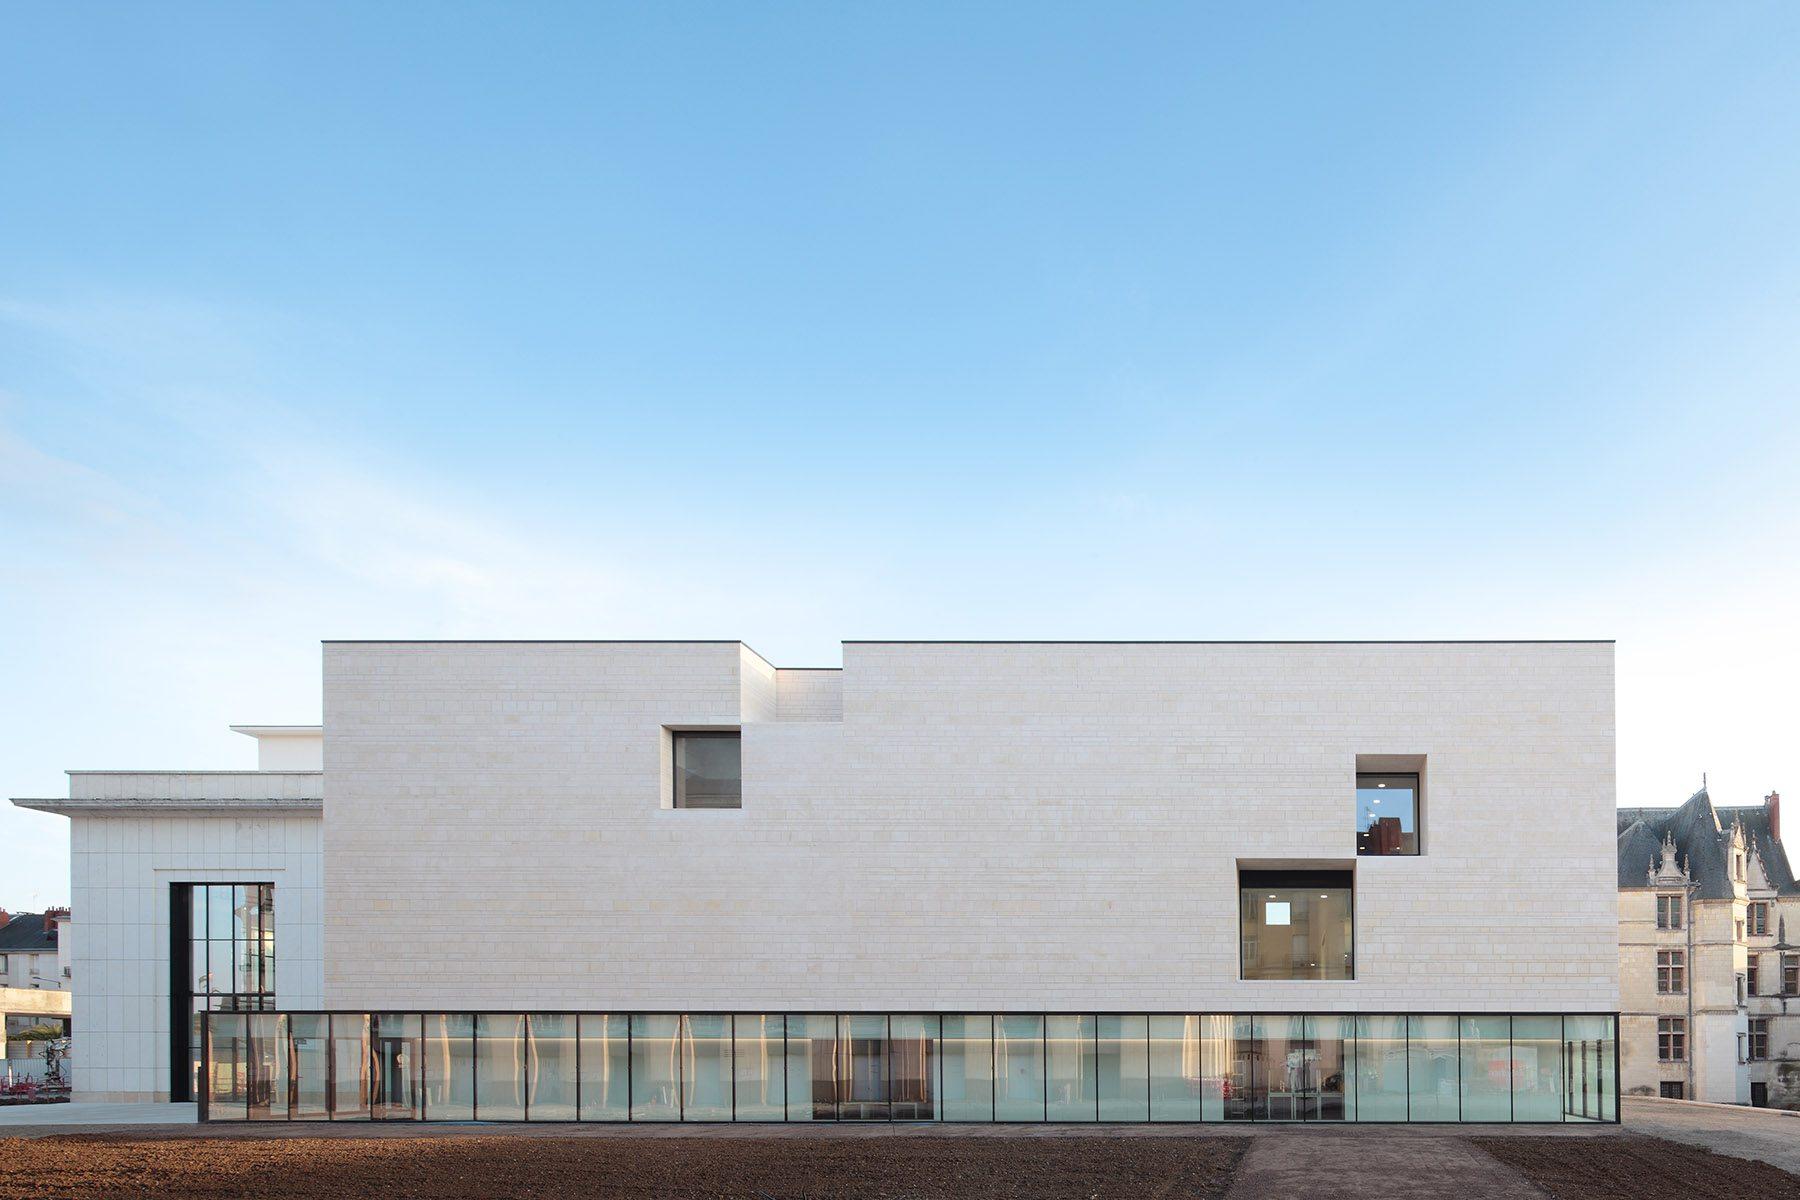 Tours. Erst 2017 eröffnete das Centre de Création Contemporaine Olivier Debré (CCCOD) der portugiesischen Architektenbrüder Manuel und Francisco Aires Mateus.